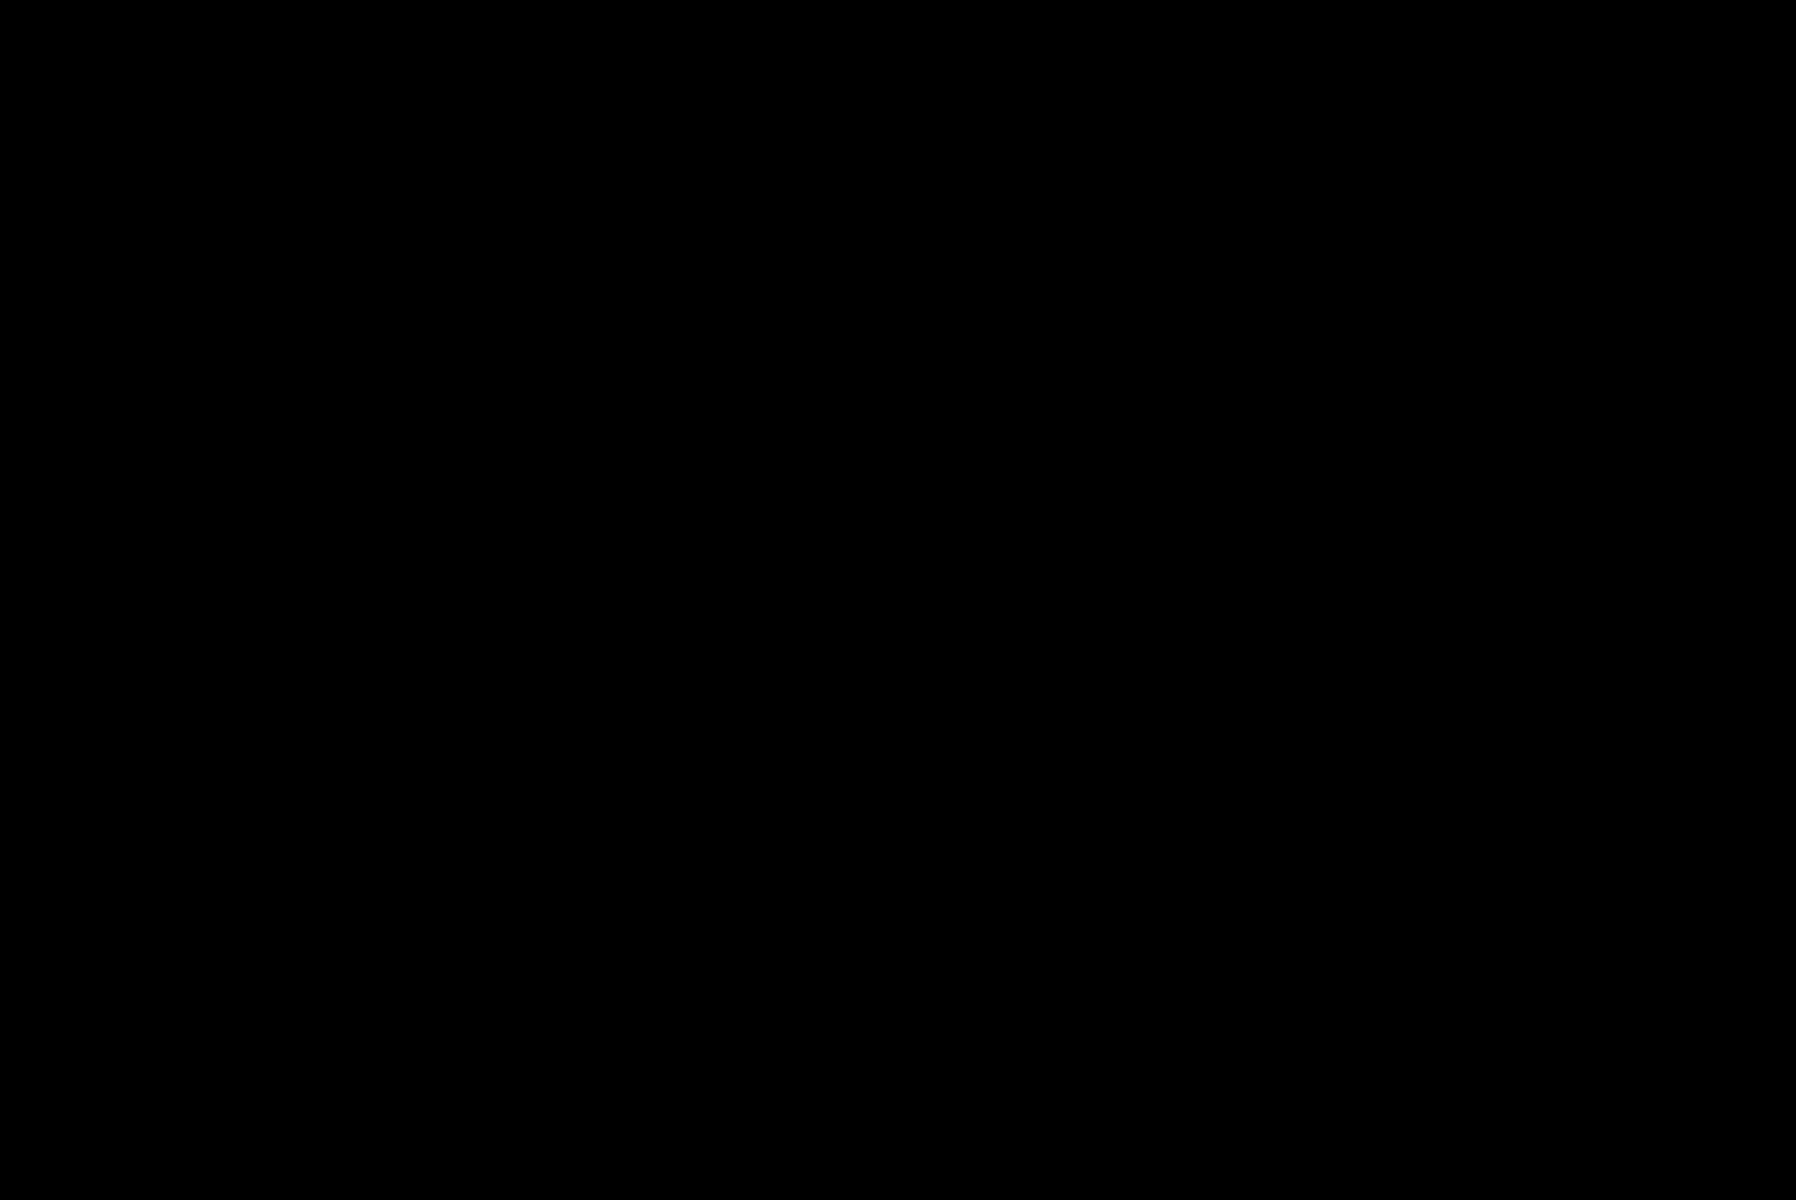 lukuliike_logo_tr.png